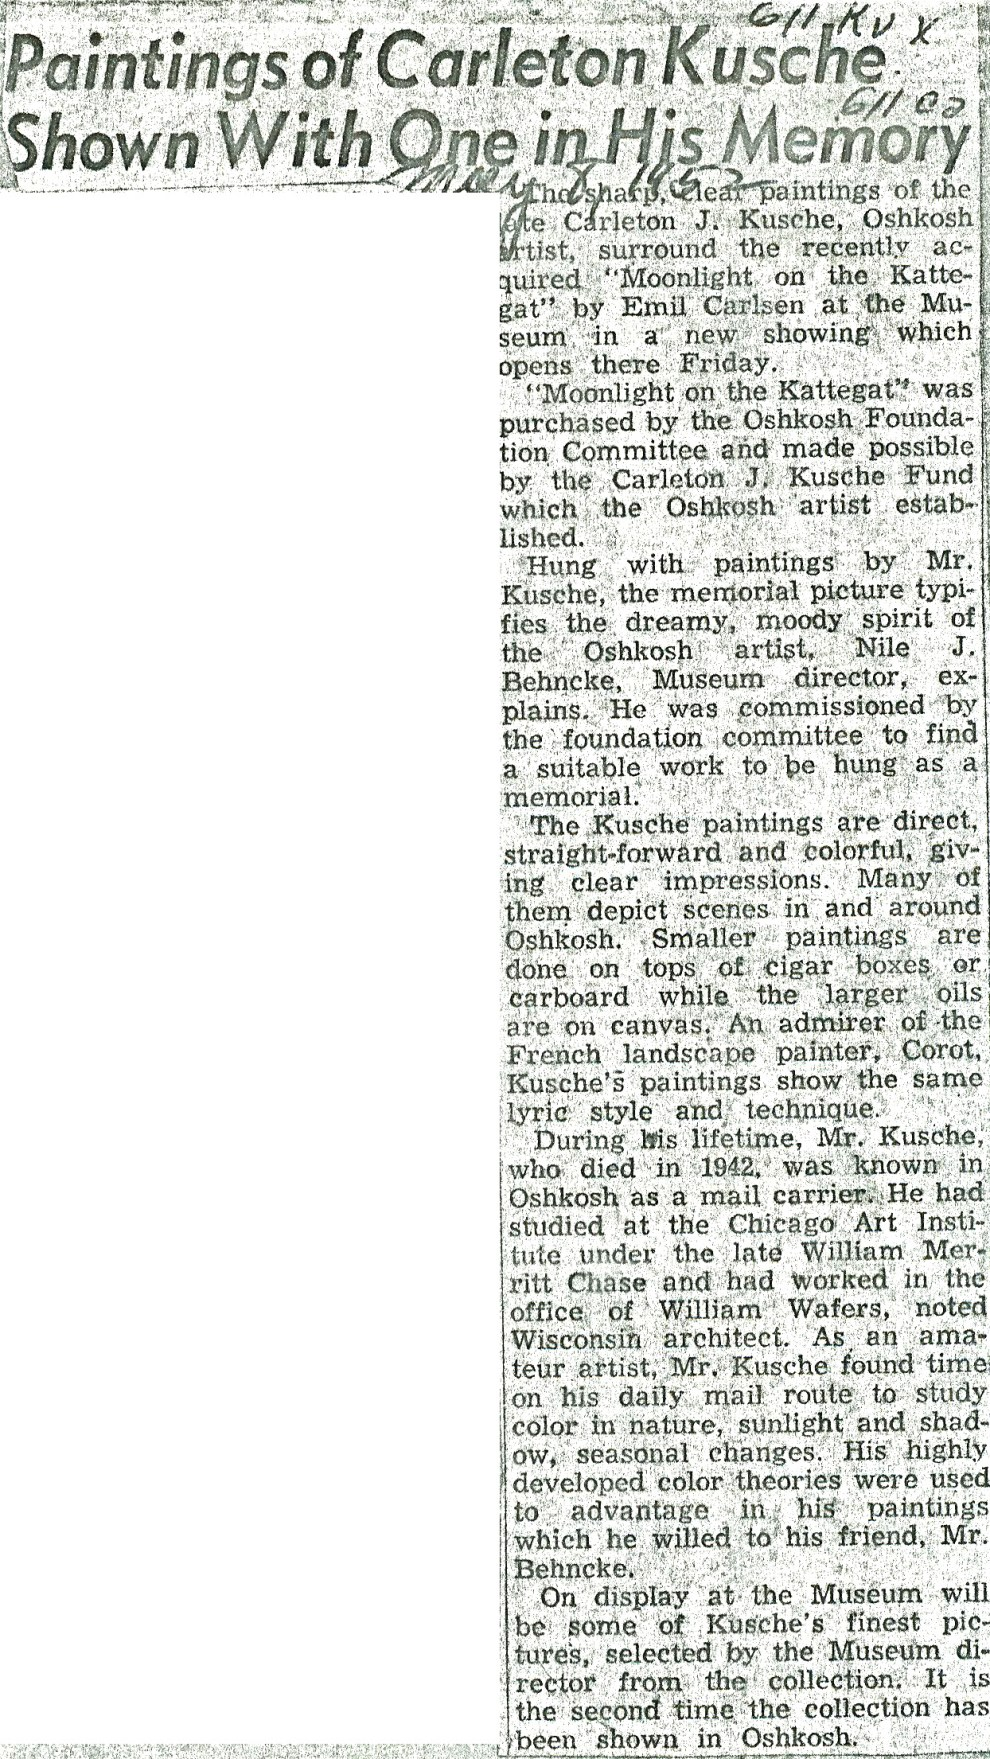 "Oshkosh Daily Northwestern, Oshkosh, WI, ""Carlsen Painting is Hung In Museum to Pay Honor to Kusche"", May 7, 1952"